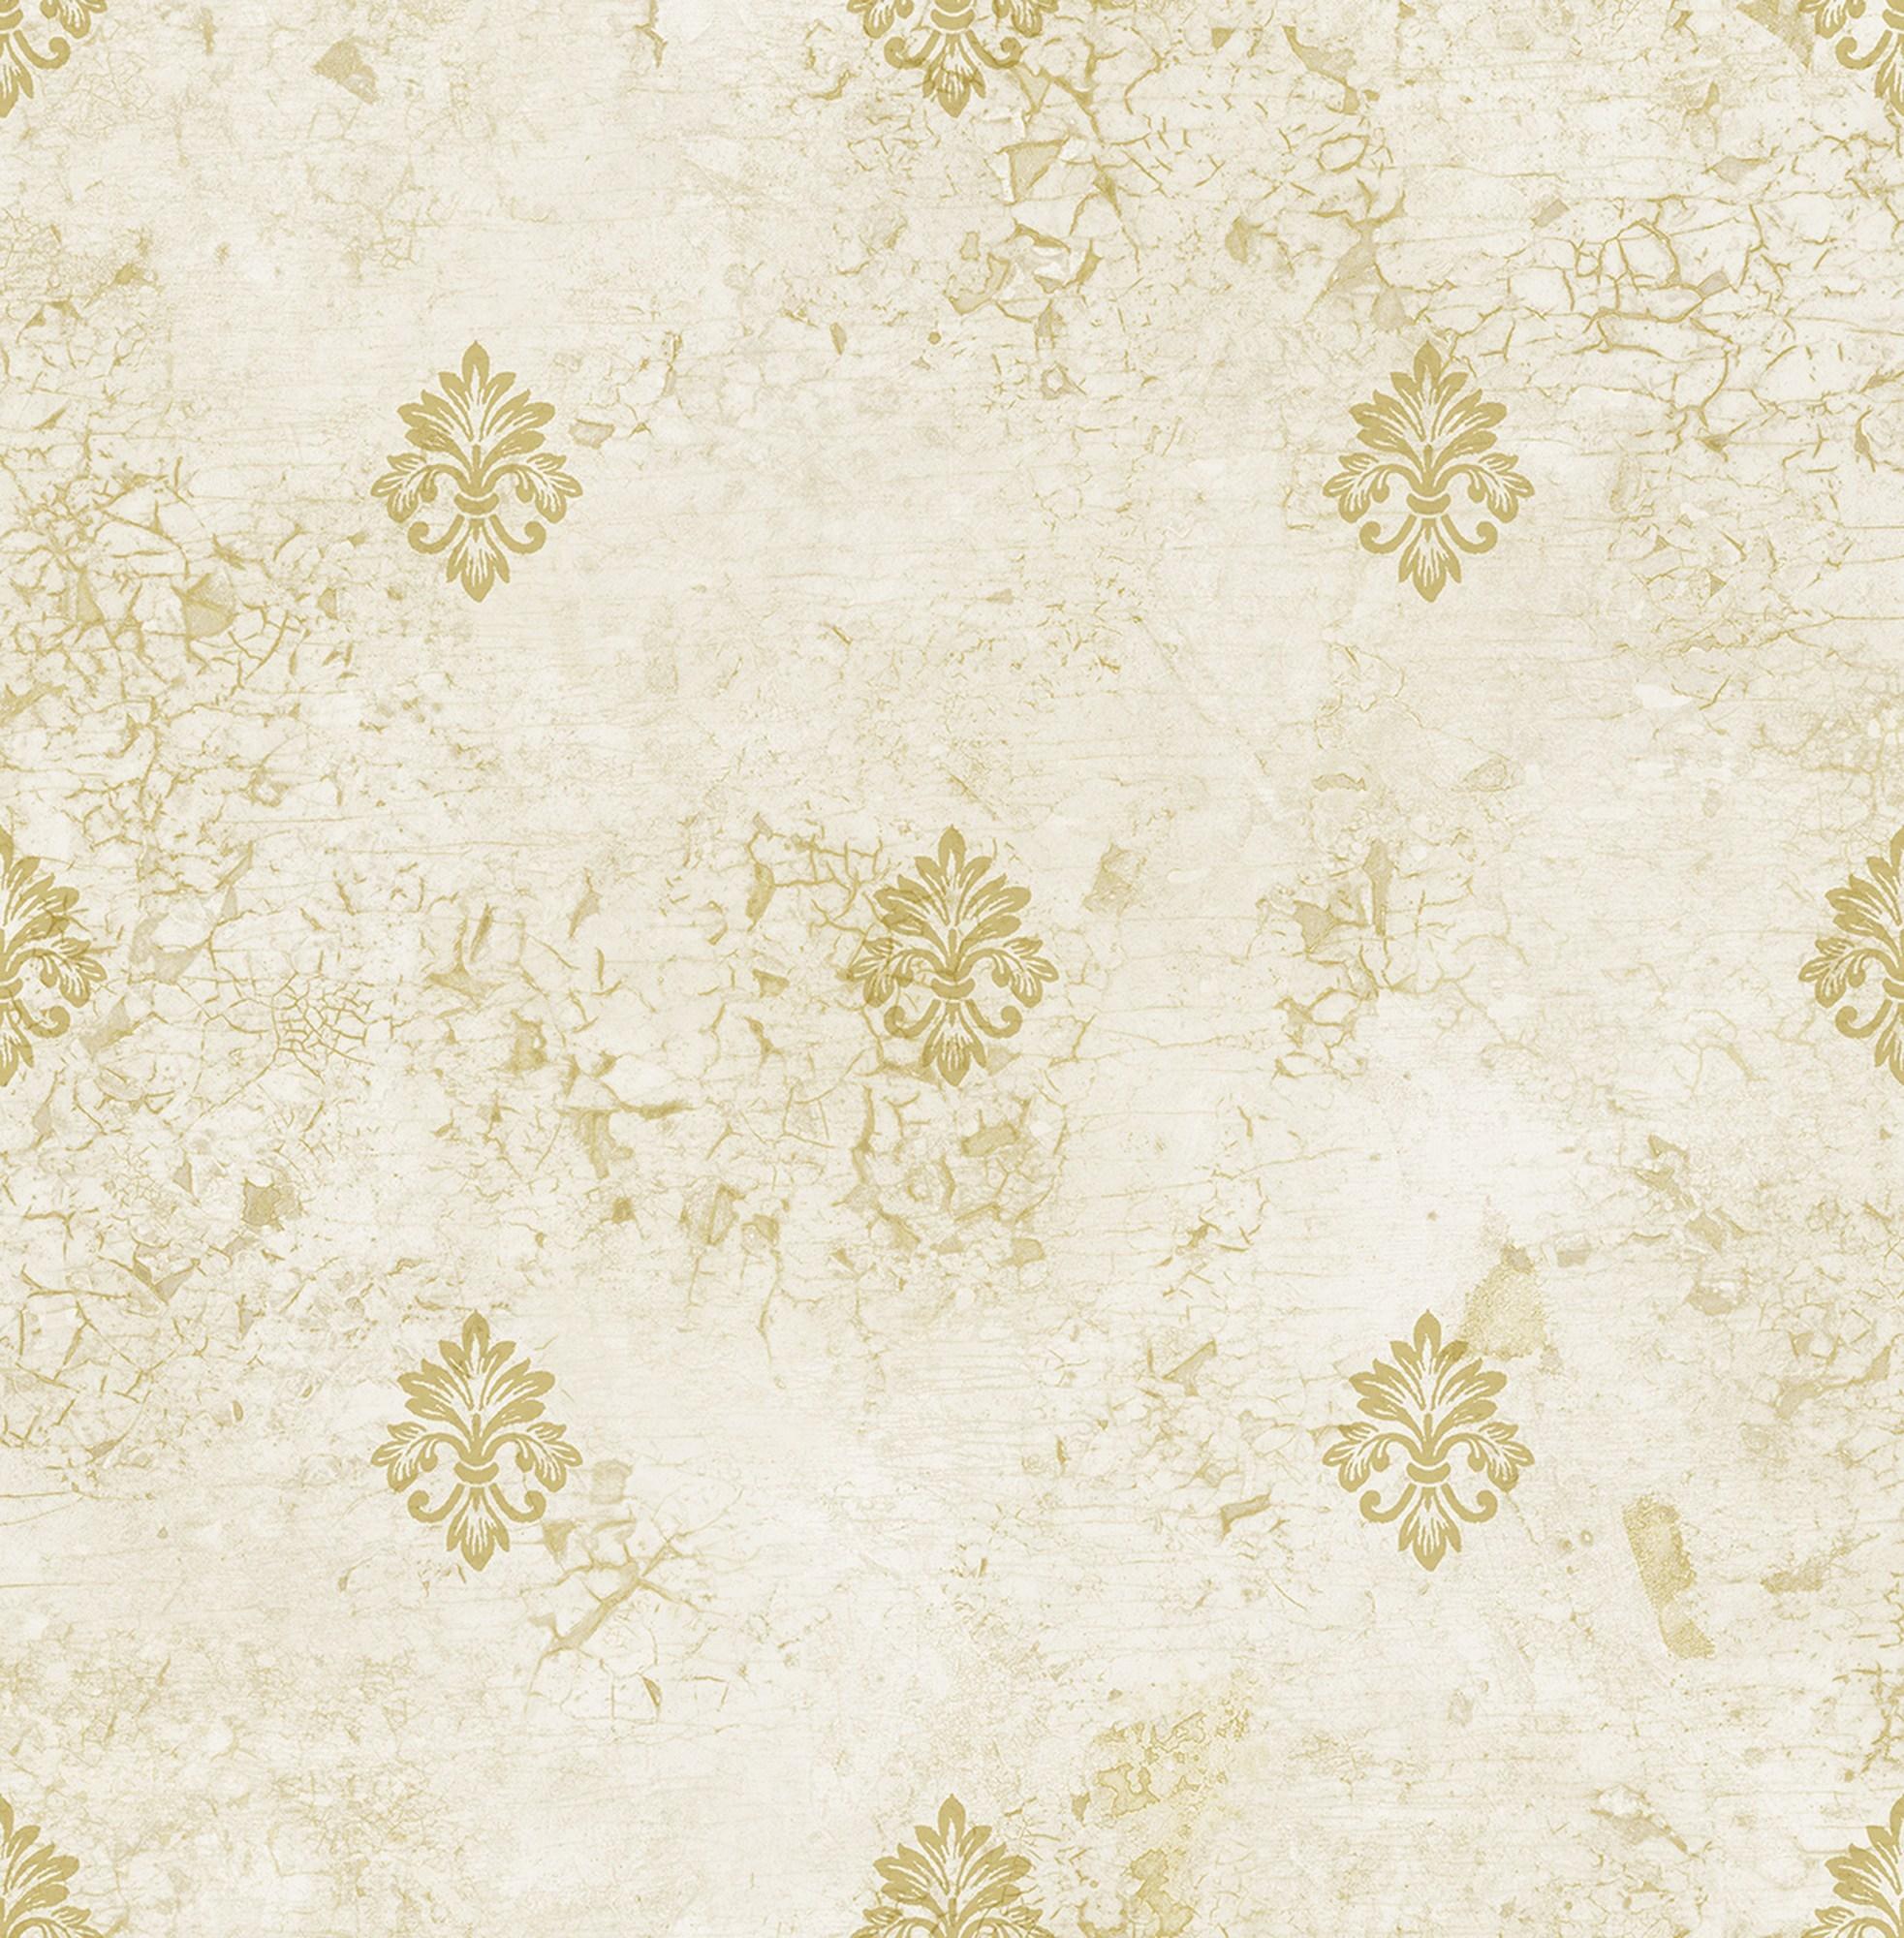 Distressed Fleur de lis Wallpaper in Shinning DV50105 from ...